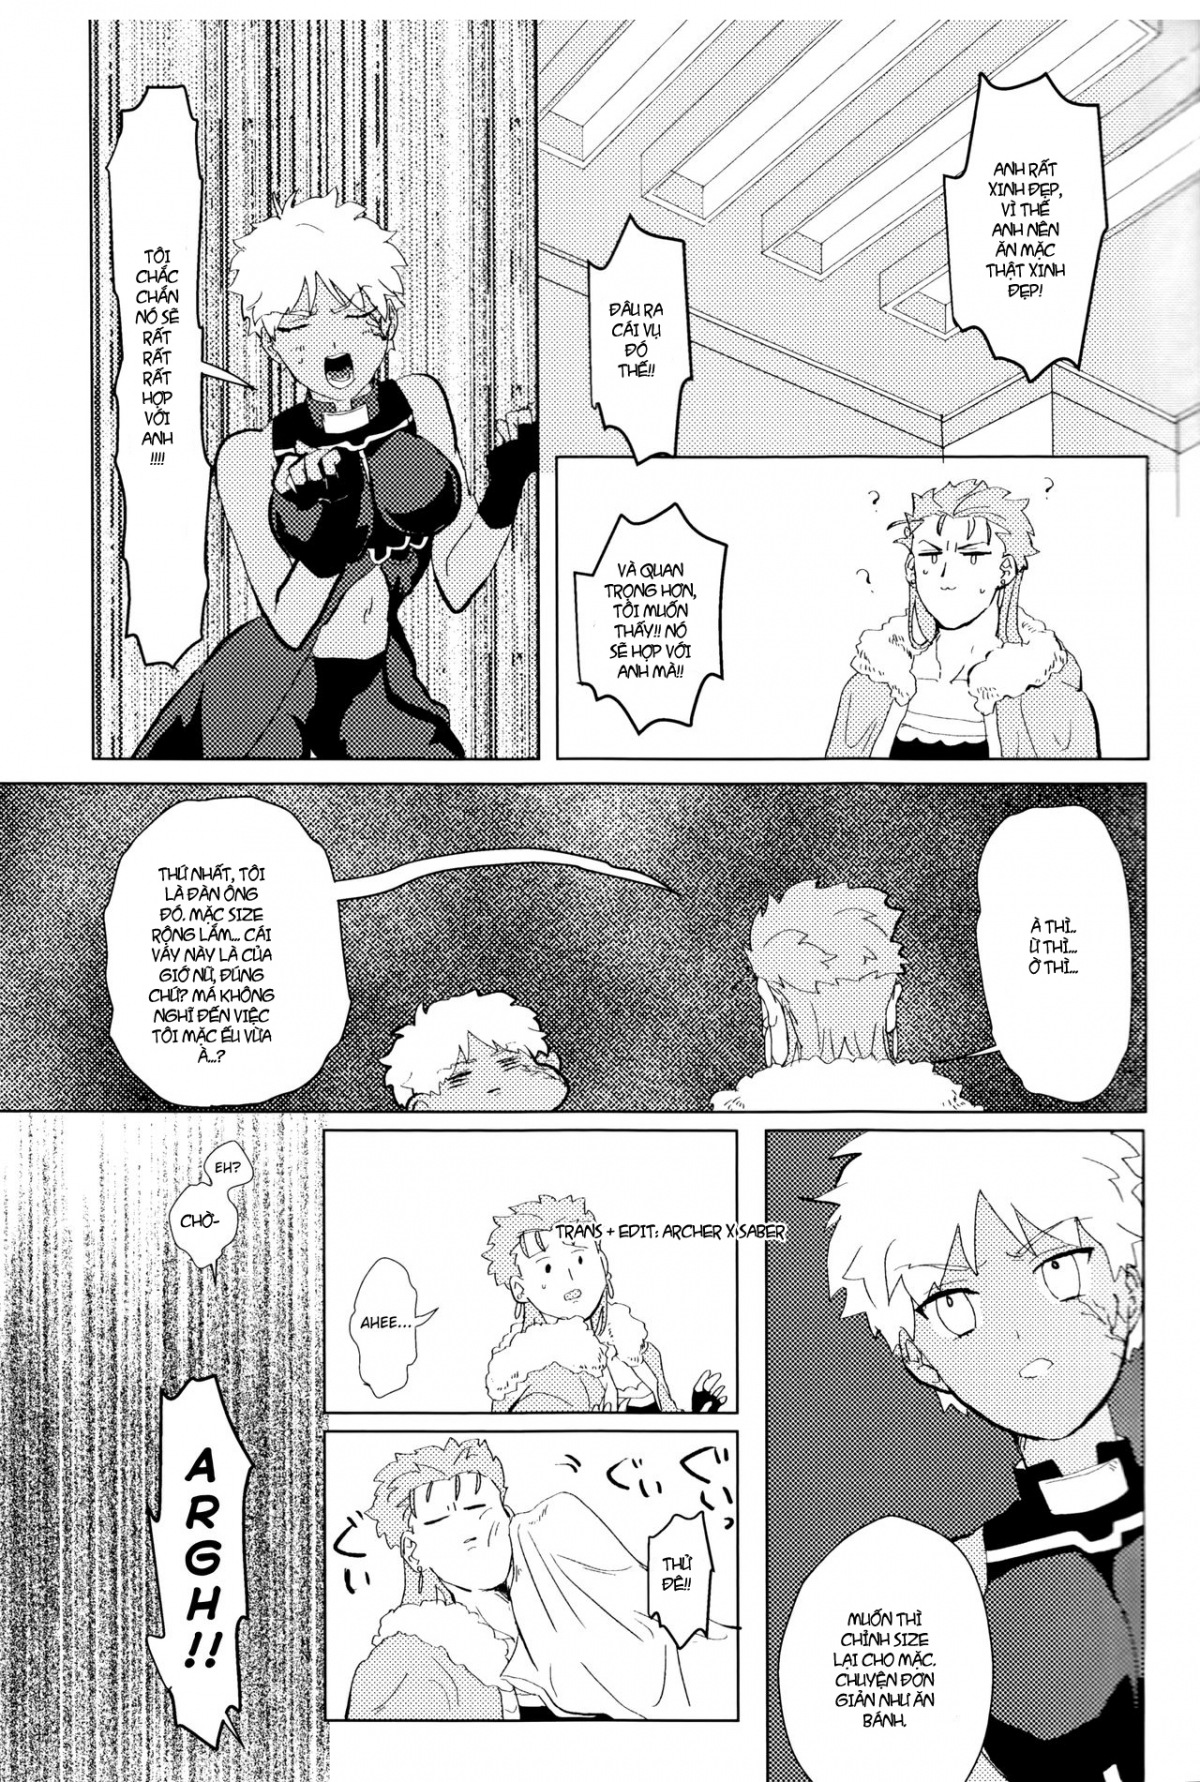 HentaiVN.net - Ảnh 10 - Seventh Heavens Story (Fate/Grand Order) - Oneshot